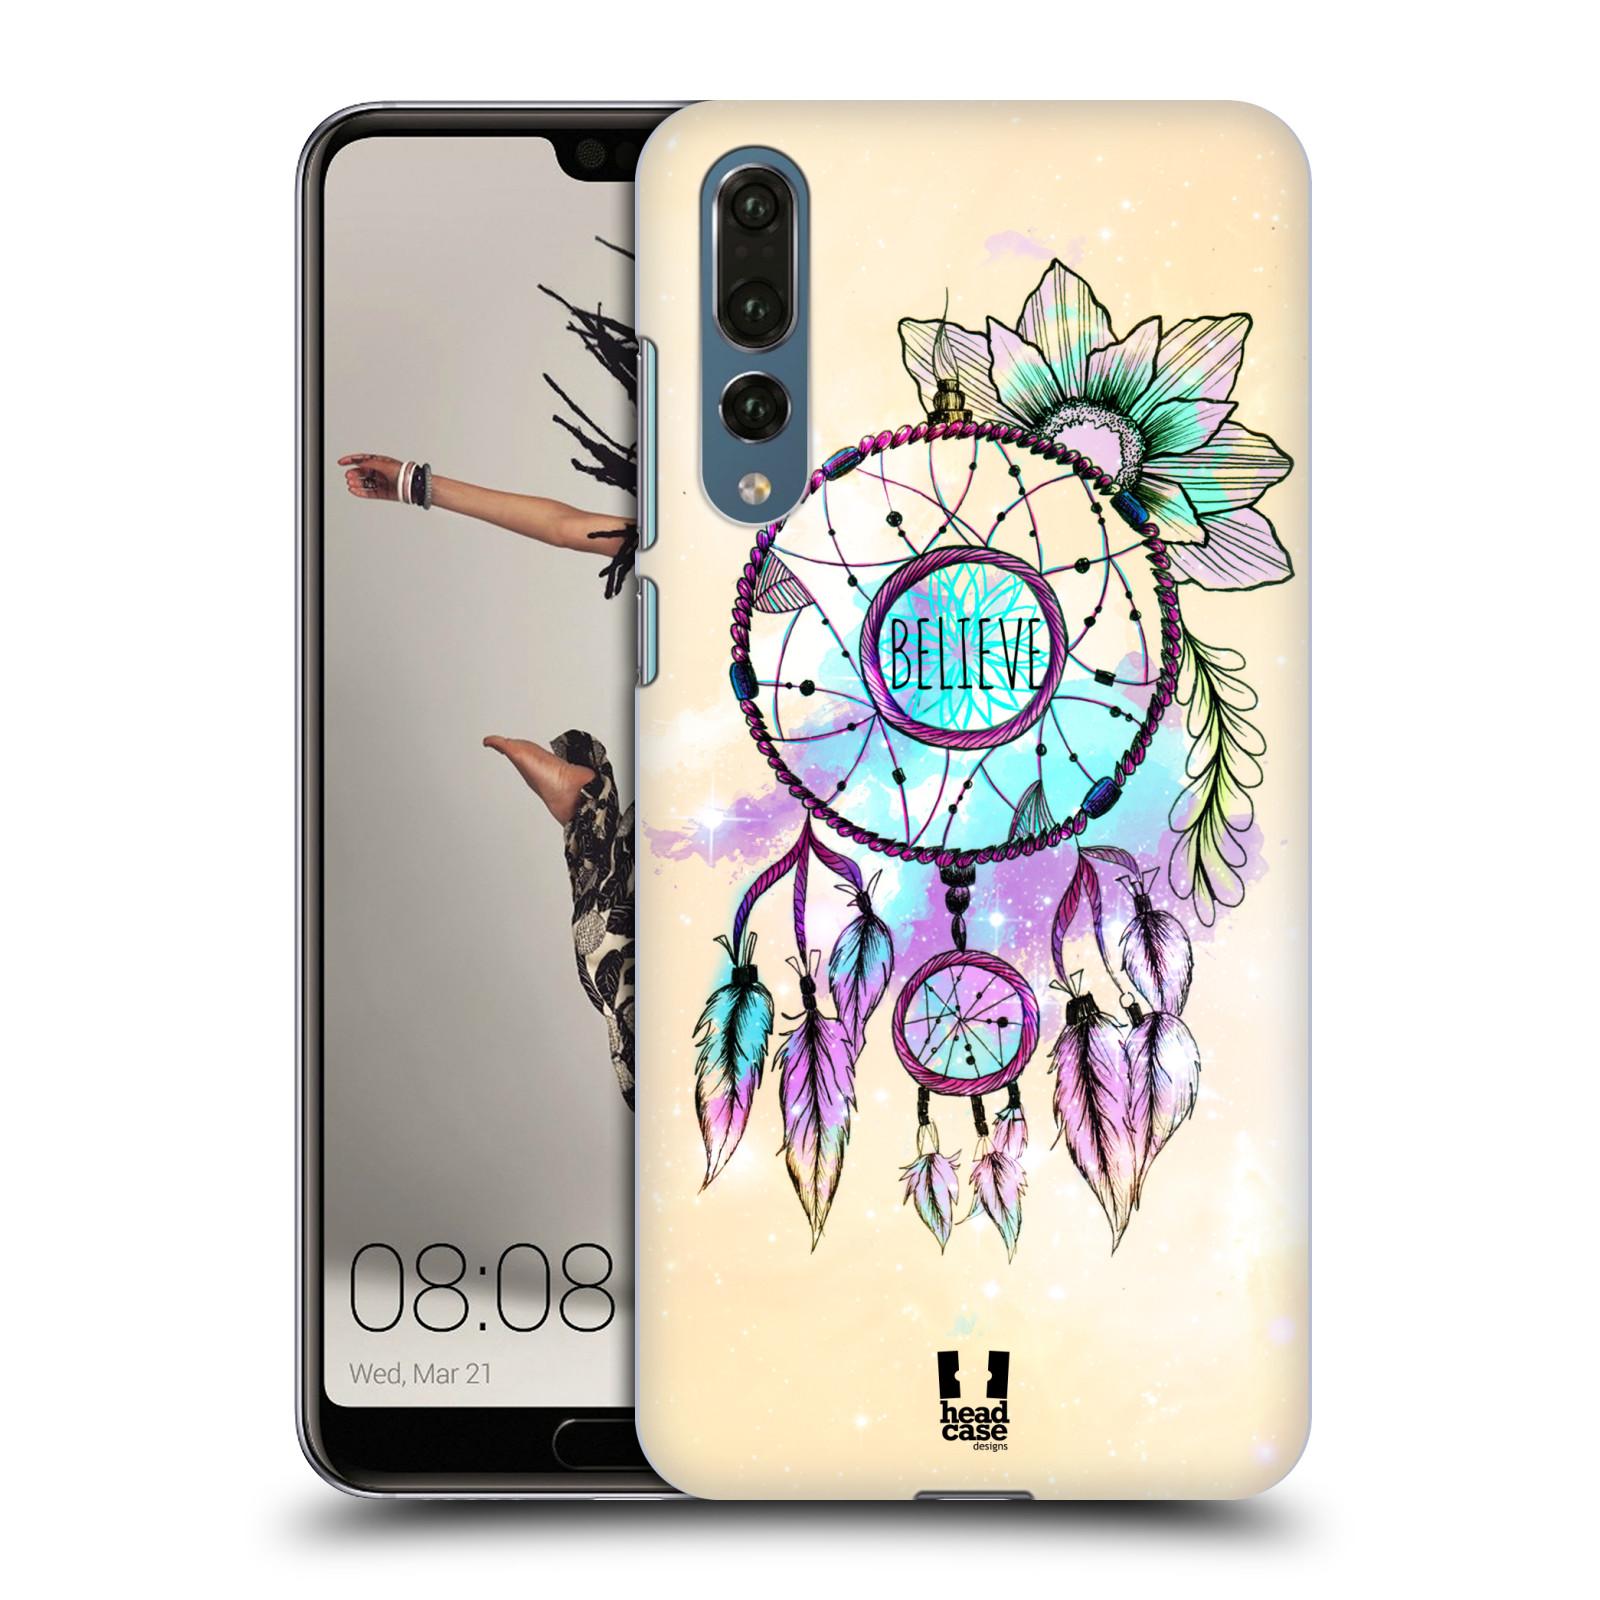 Plastové pouzdro na mobil Huawei P20 Pro - Head Case - MIX BELIEVE